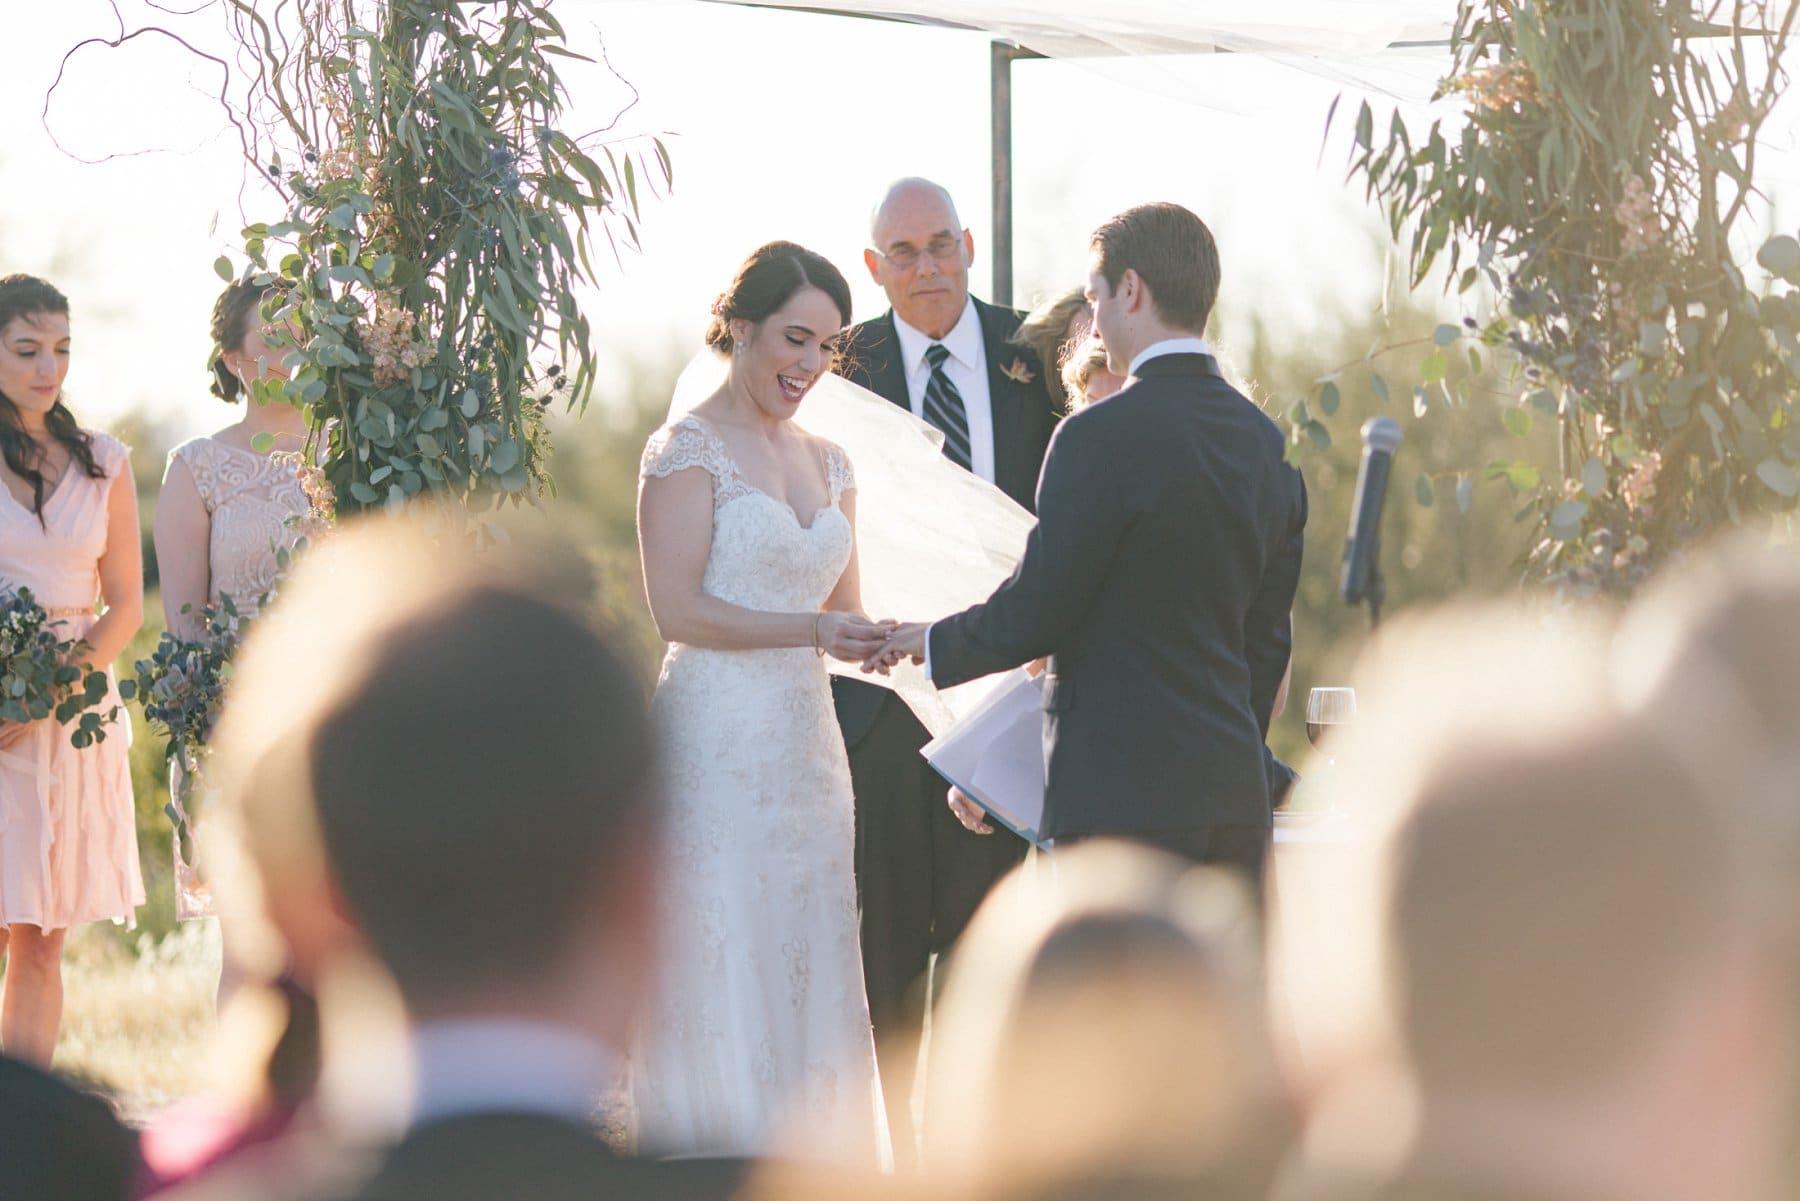 wedding ceremony outdoors at Desert Foothills barn wedding